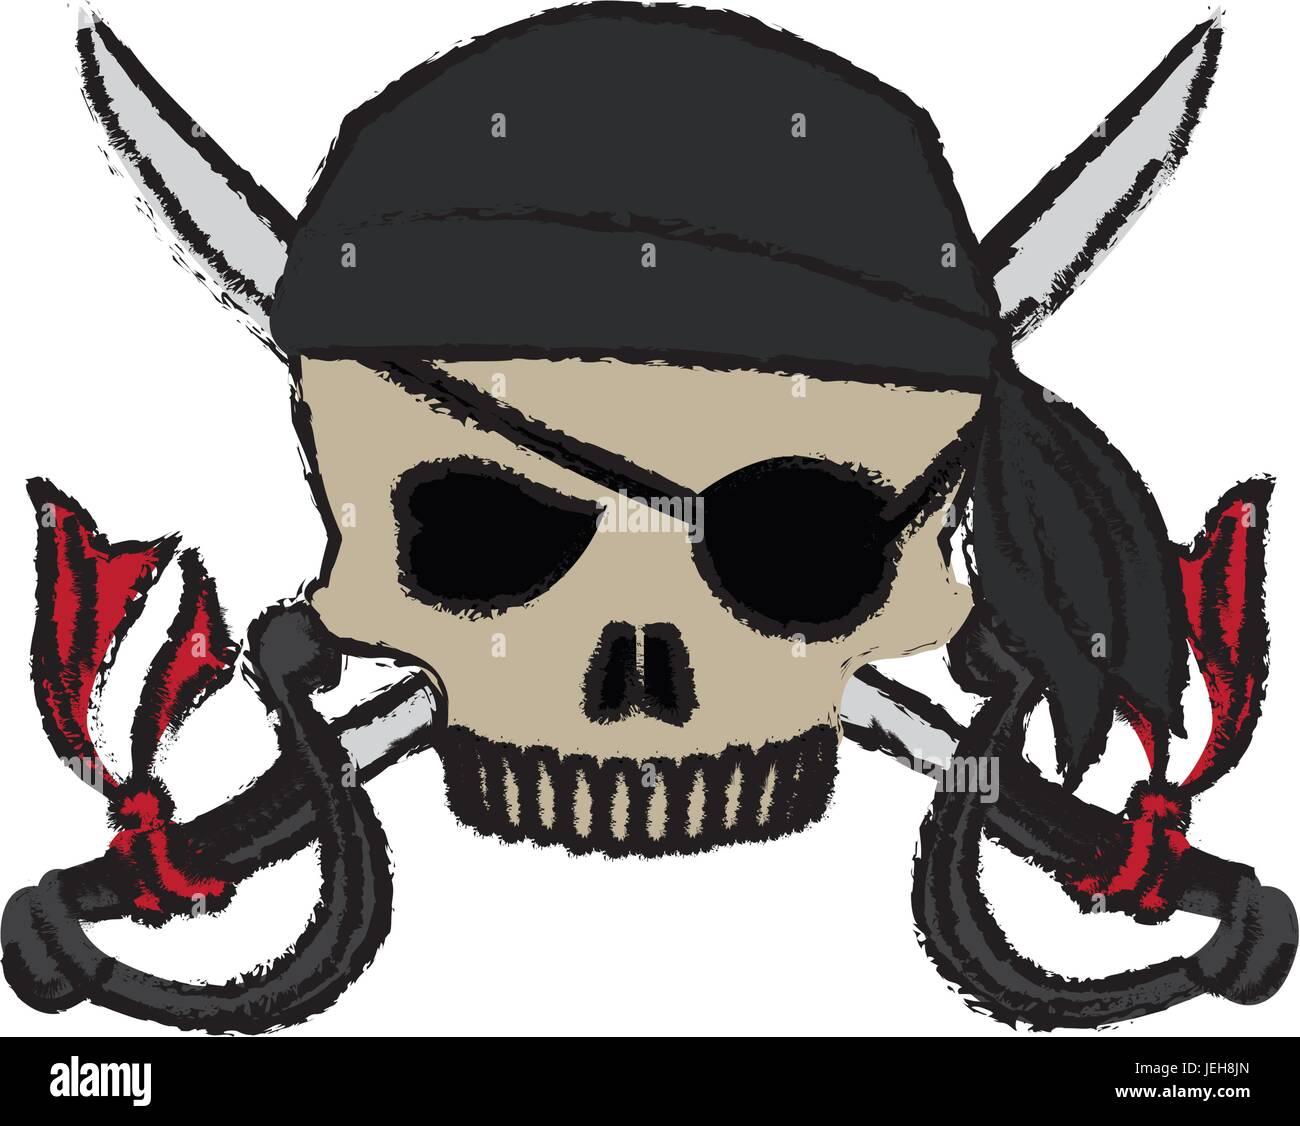 cartoon pirate skull hat patch eye with cross swords - Stock Vector